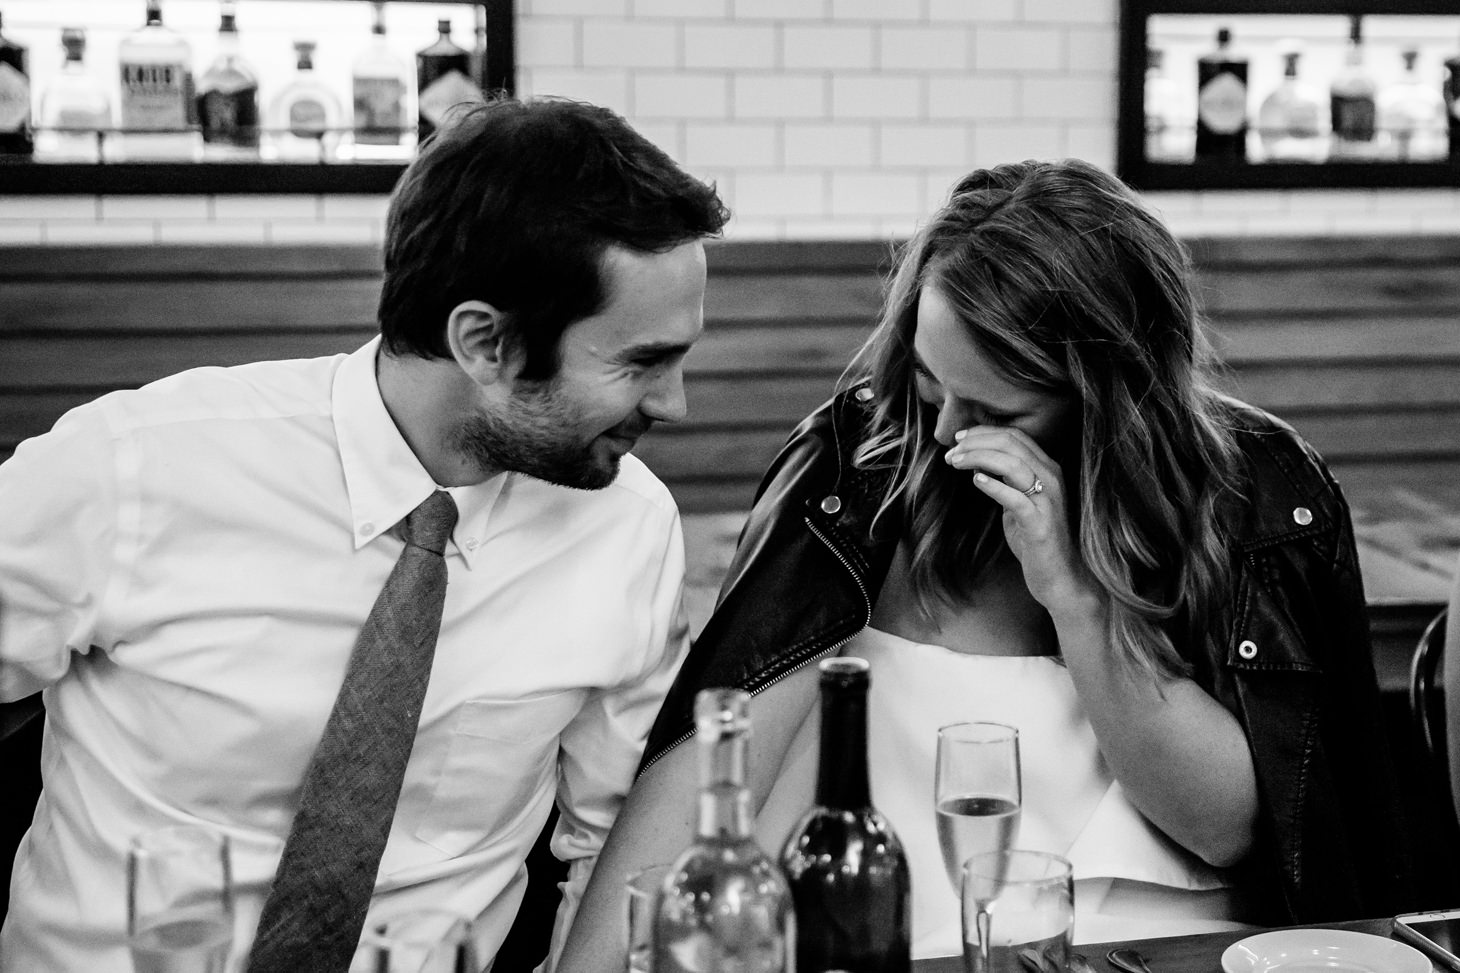 022-NYC-Intimate-Wedding-photography-SmittenChickens-city-hall-lauren-aaron.jpg